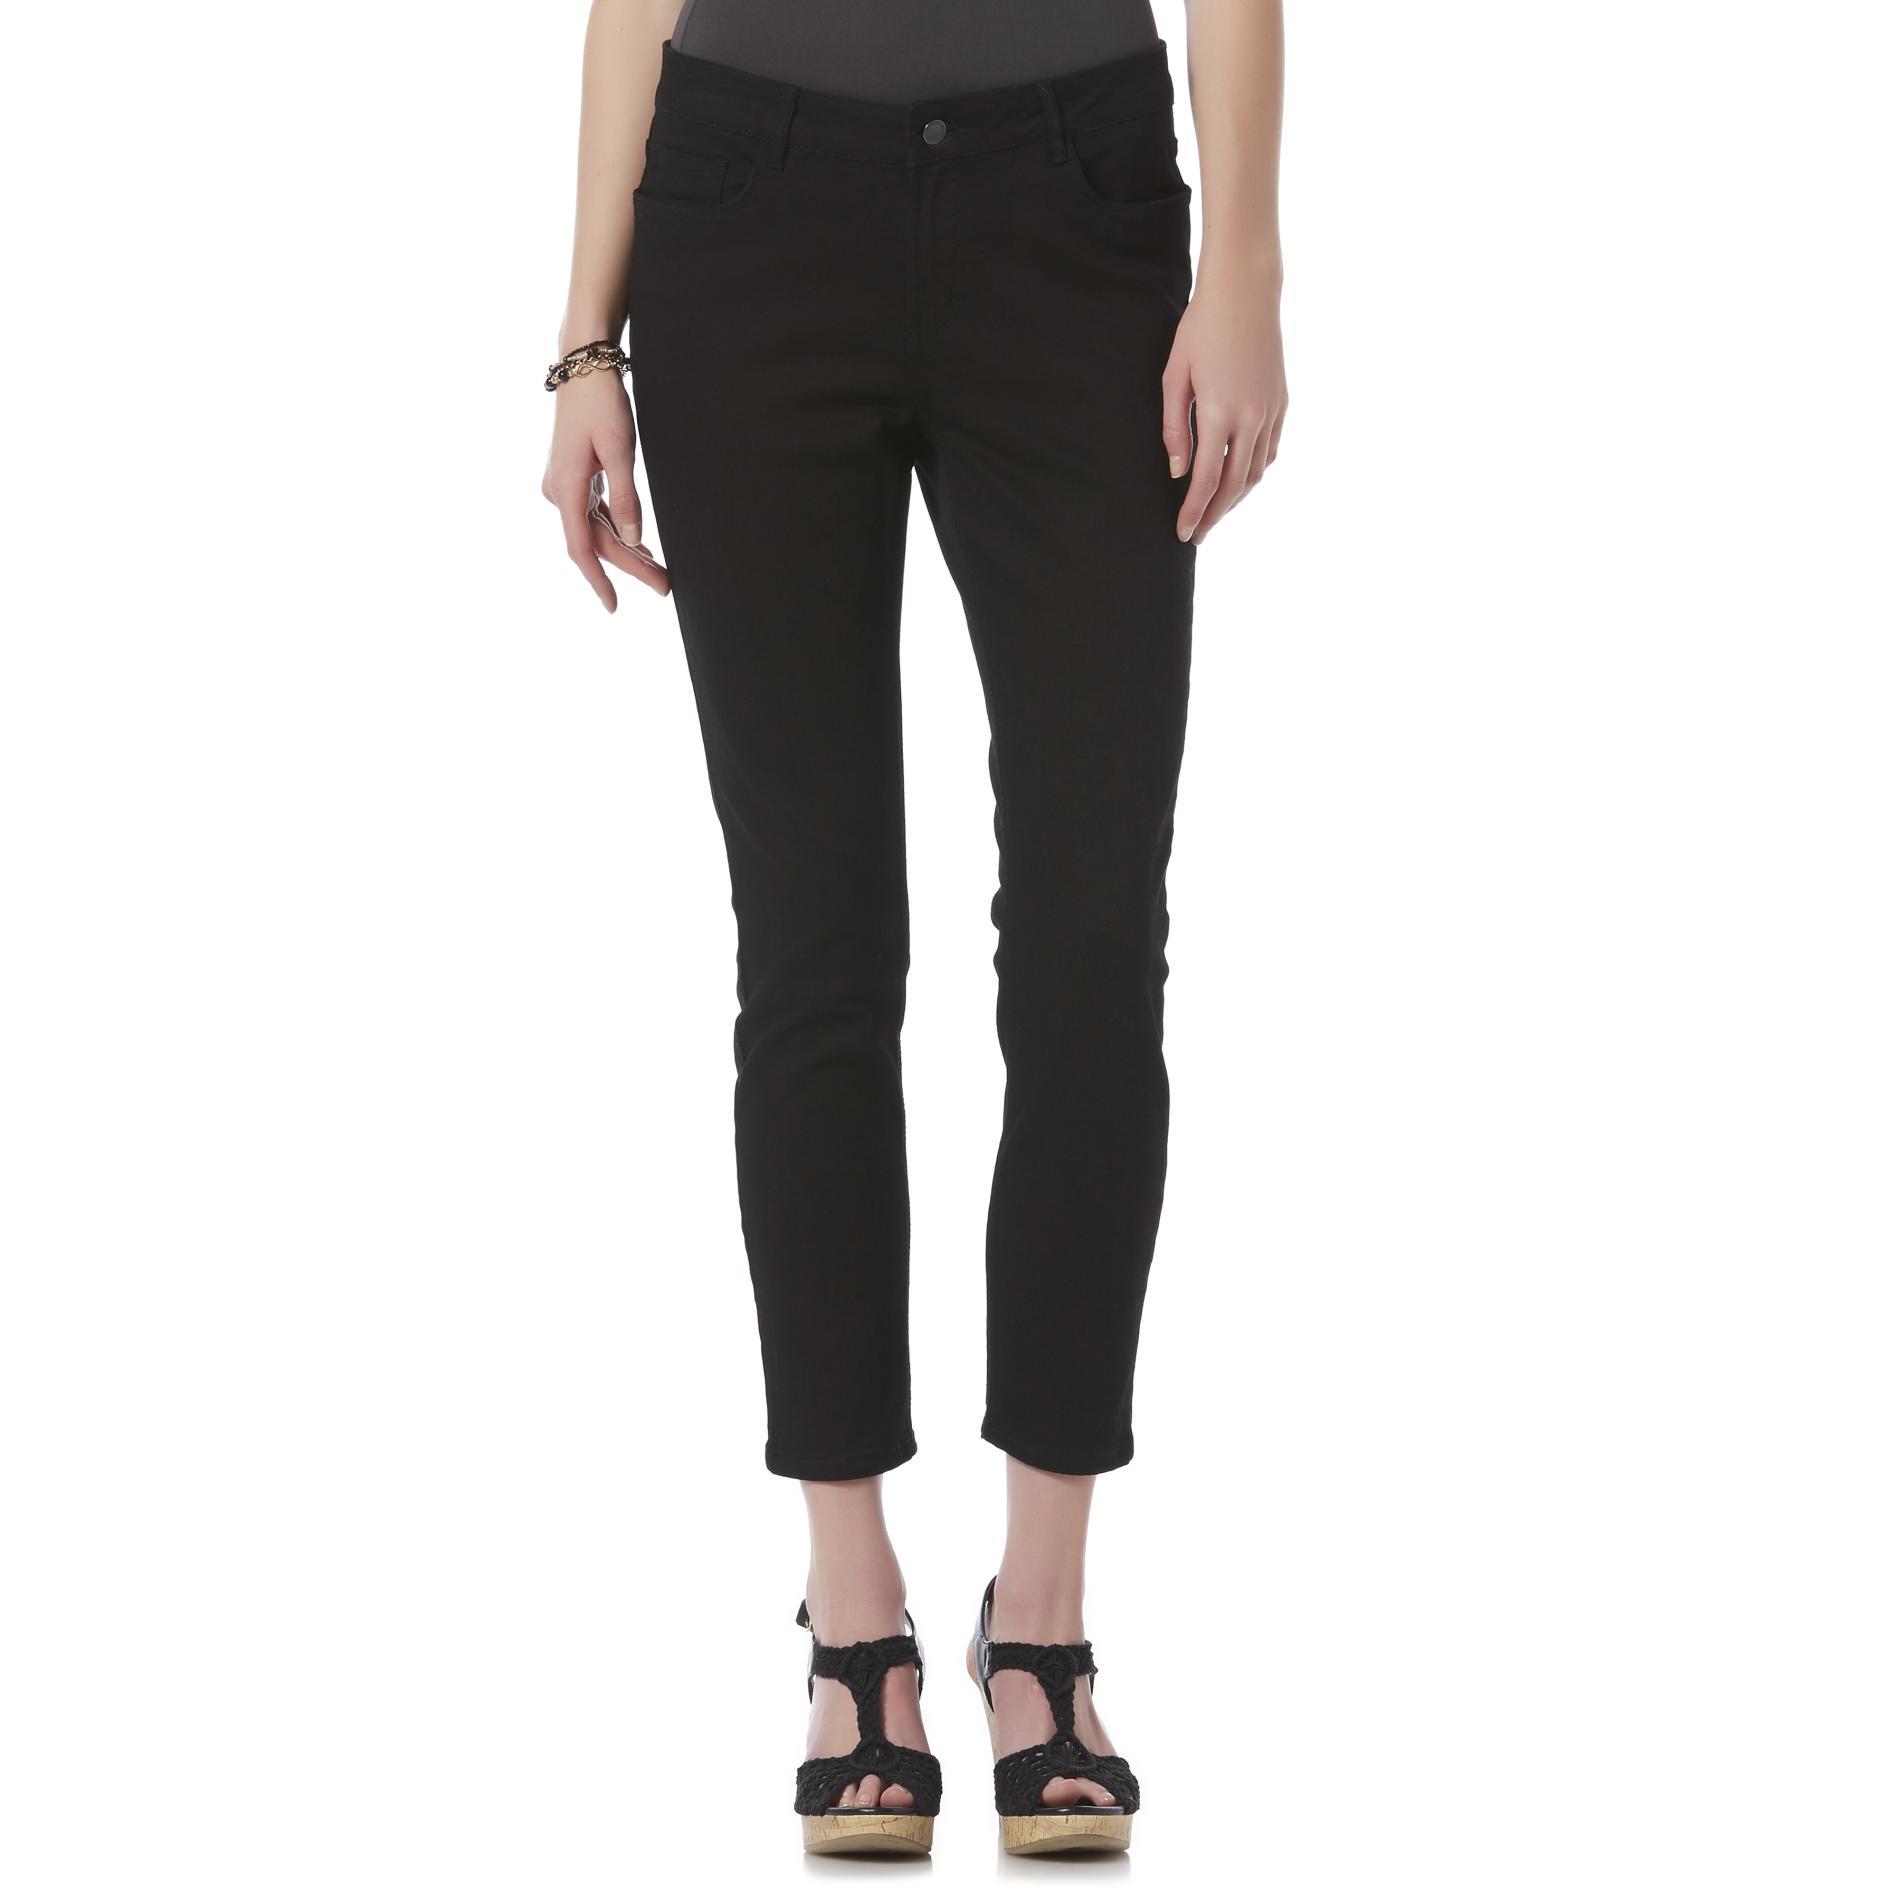 Route 66 Women's Skinny Capri Pants